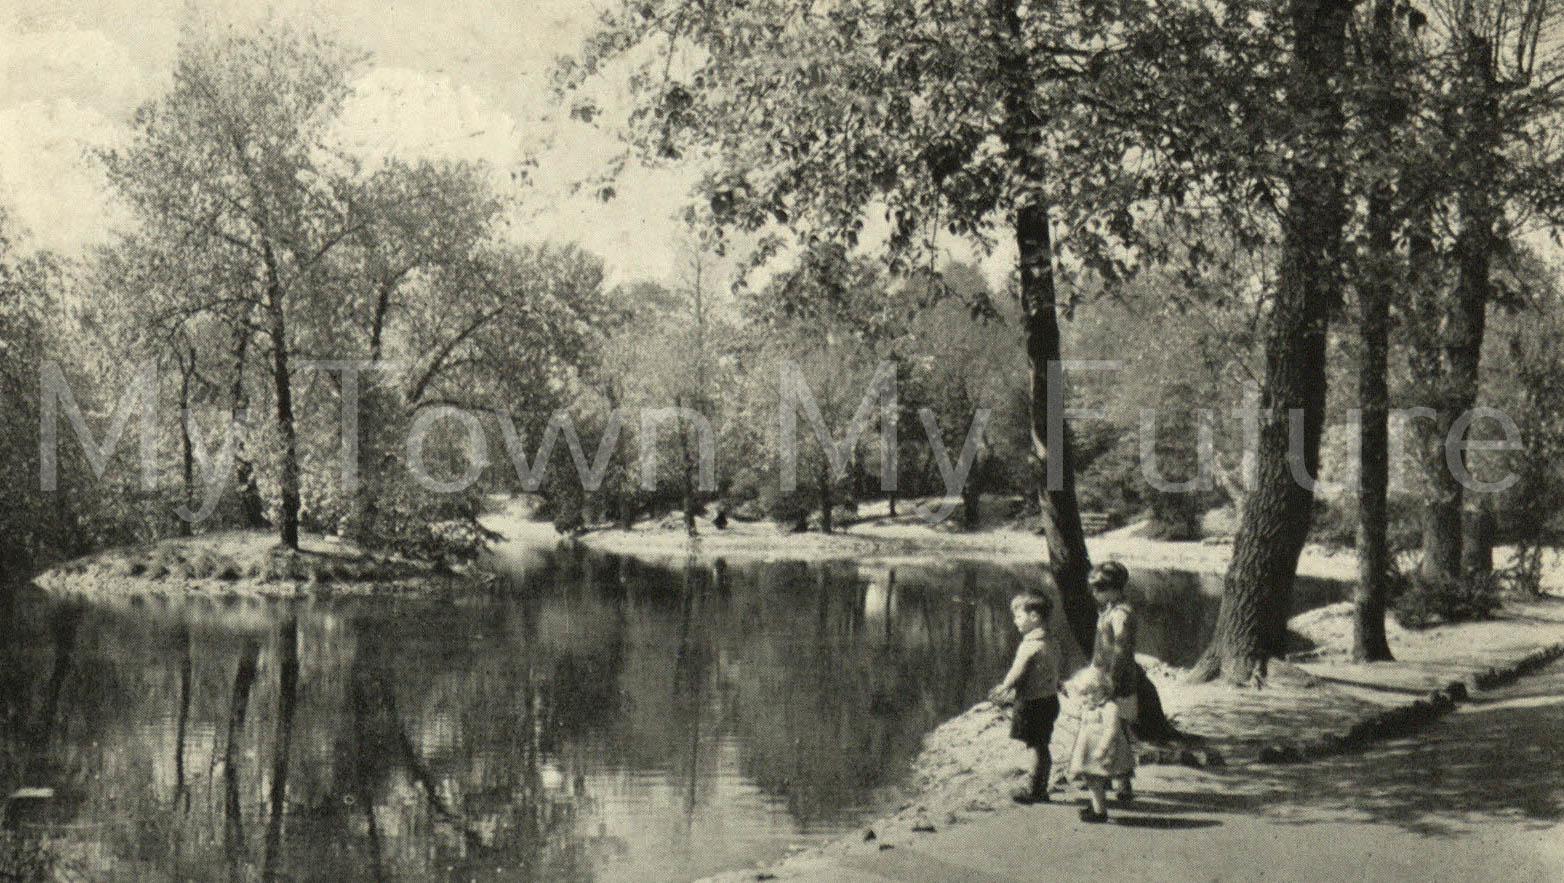 Albert Park - Postcard - The Lake, postmarked September 1948 - Valentine Series - Dundee